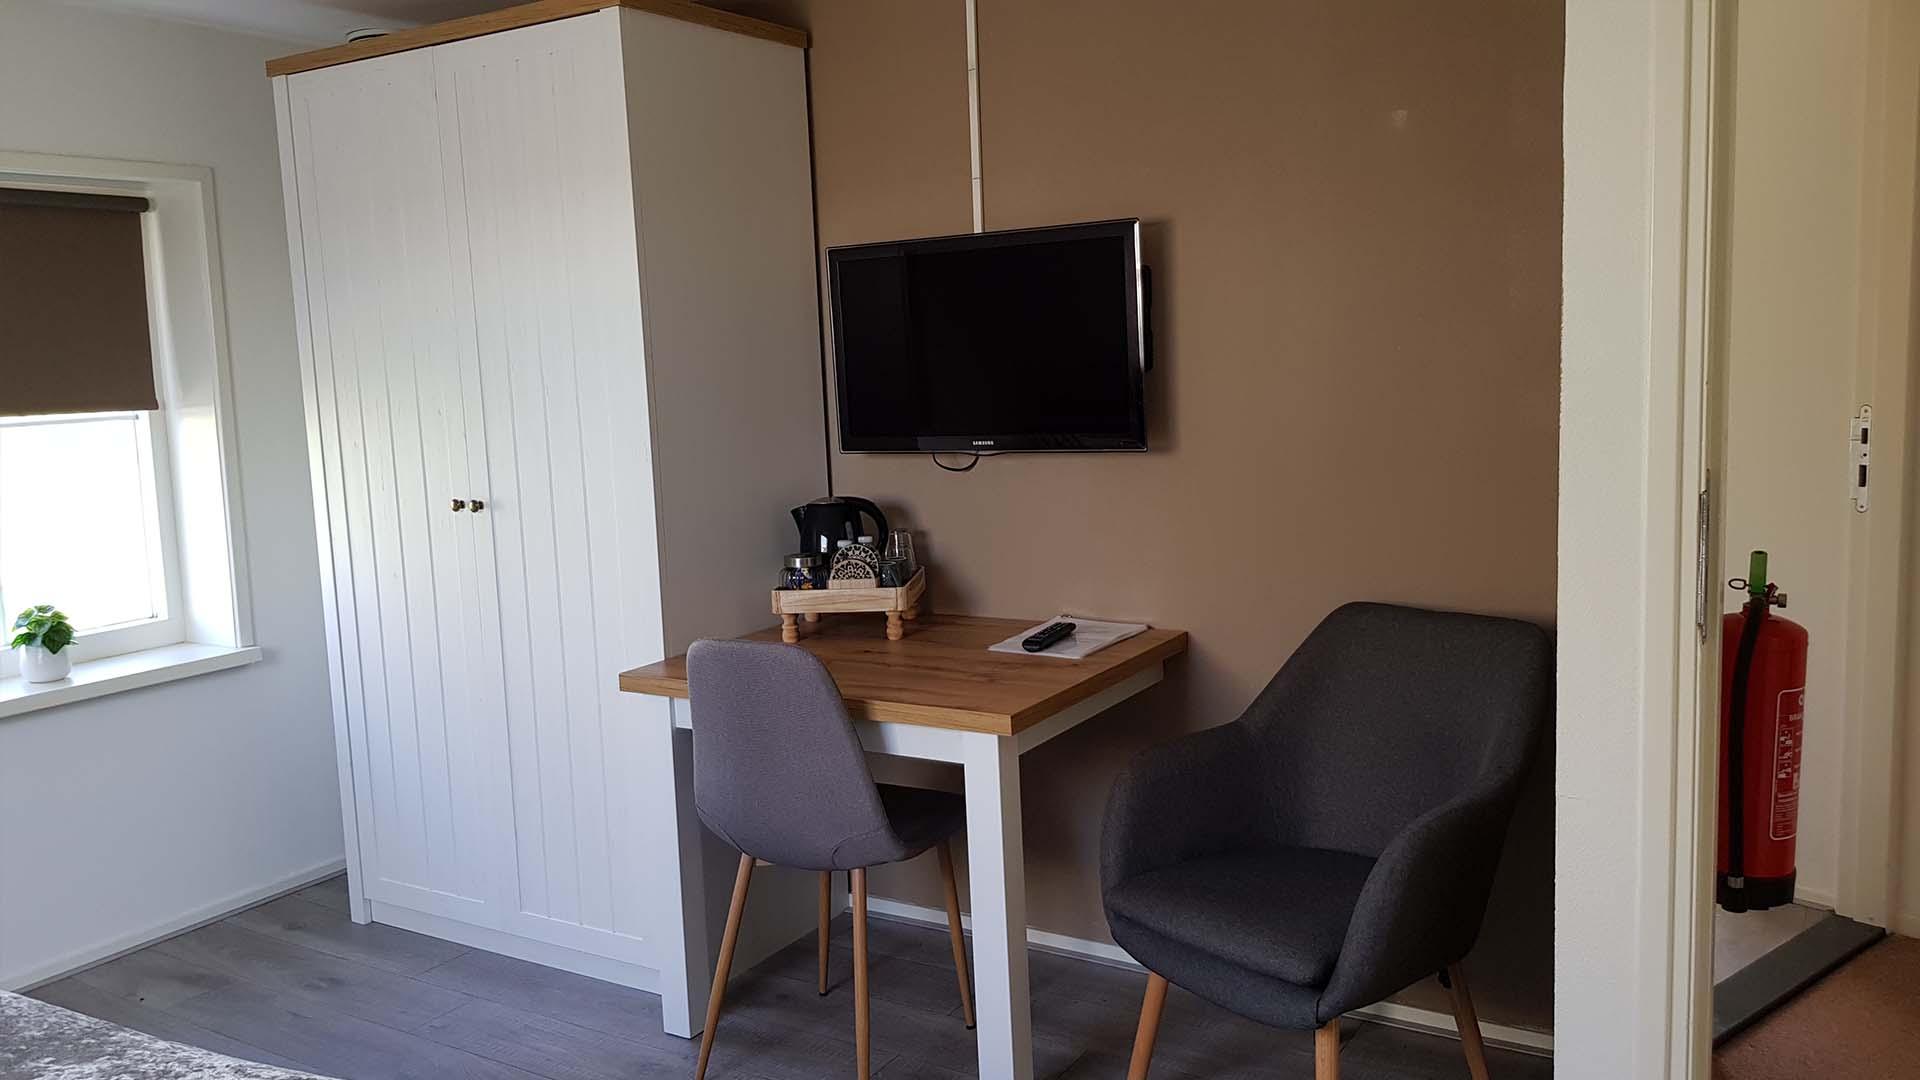 kamer 1 bureau B&B Plompetorenzicht Burg-Haamstede Zeeland